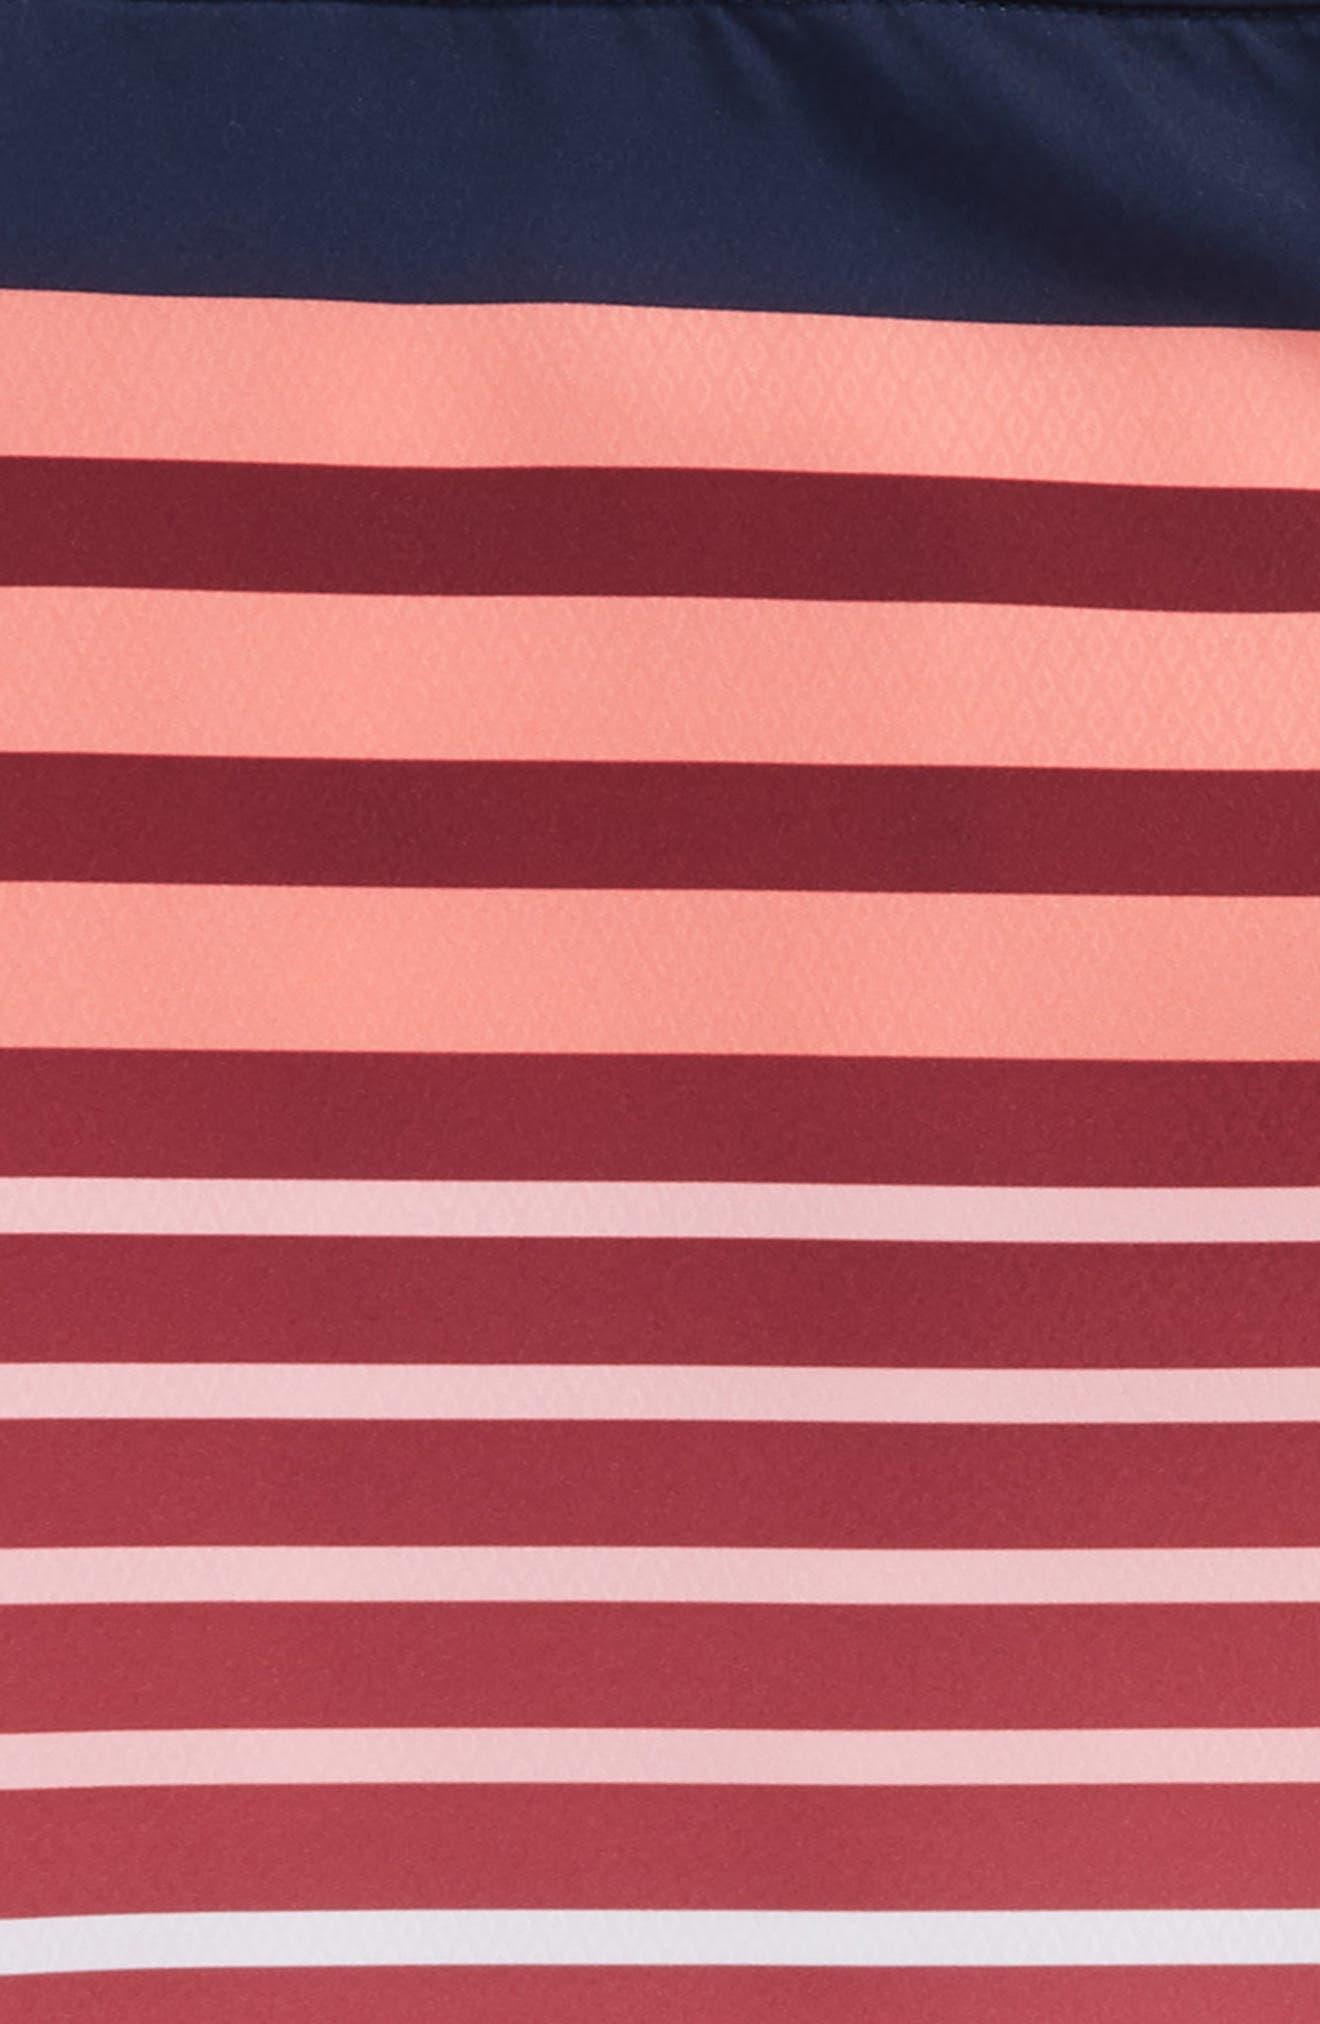 Surflodge Stripe Board Shorts,                             Alternate thumbnail 2, color,                             628